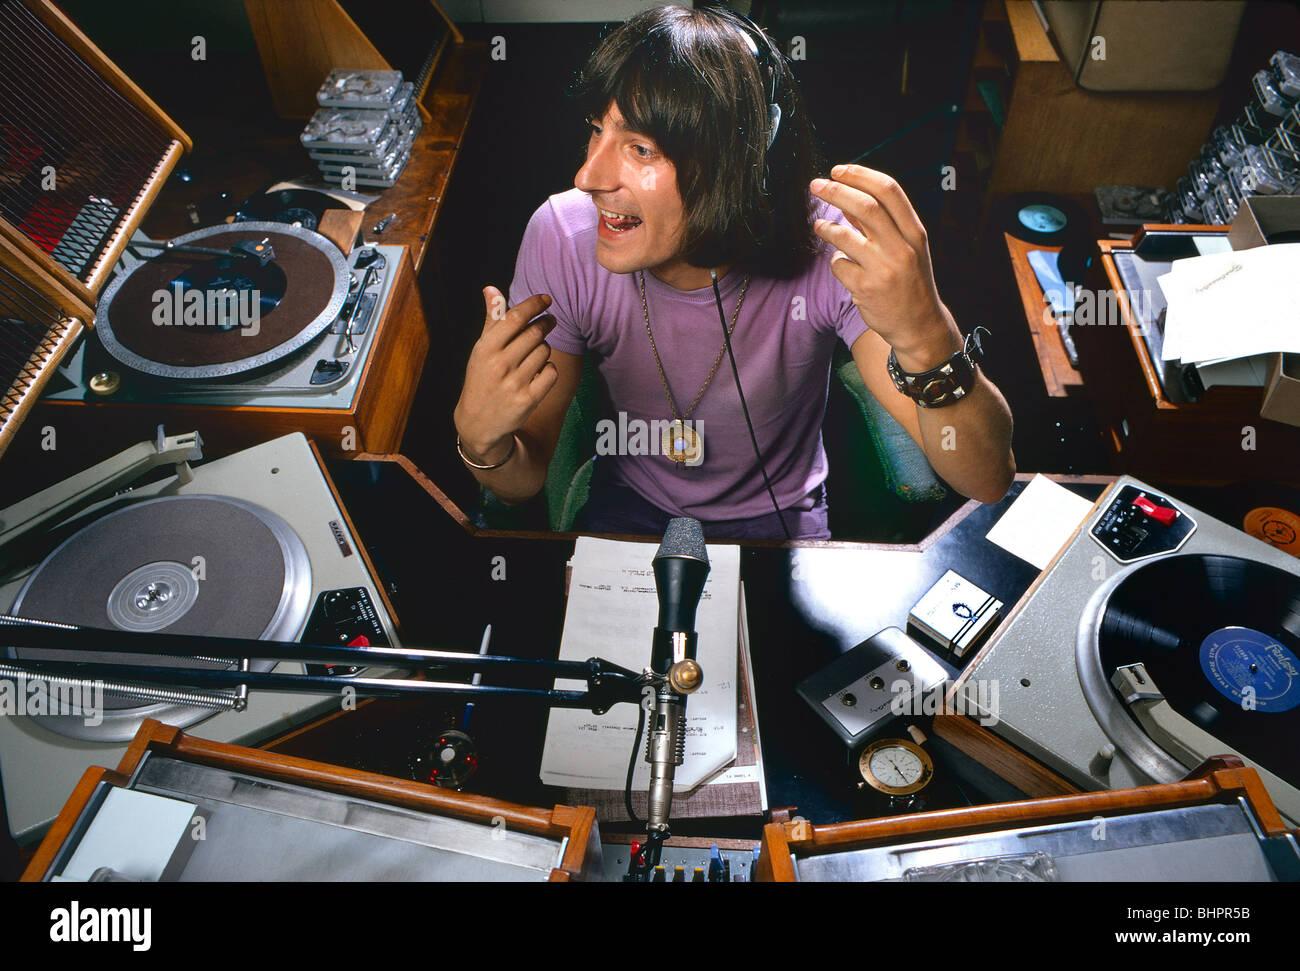 Historic 1960s Broadcasting At BBC Pop Music Stuart Henry Disc Jockey Live The Show Radio 1 Studios London In